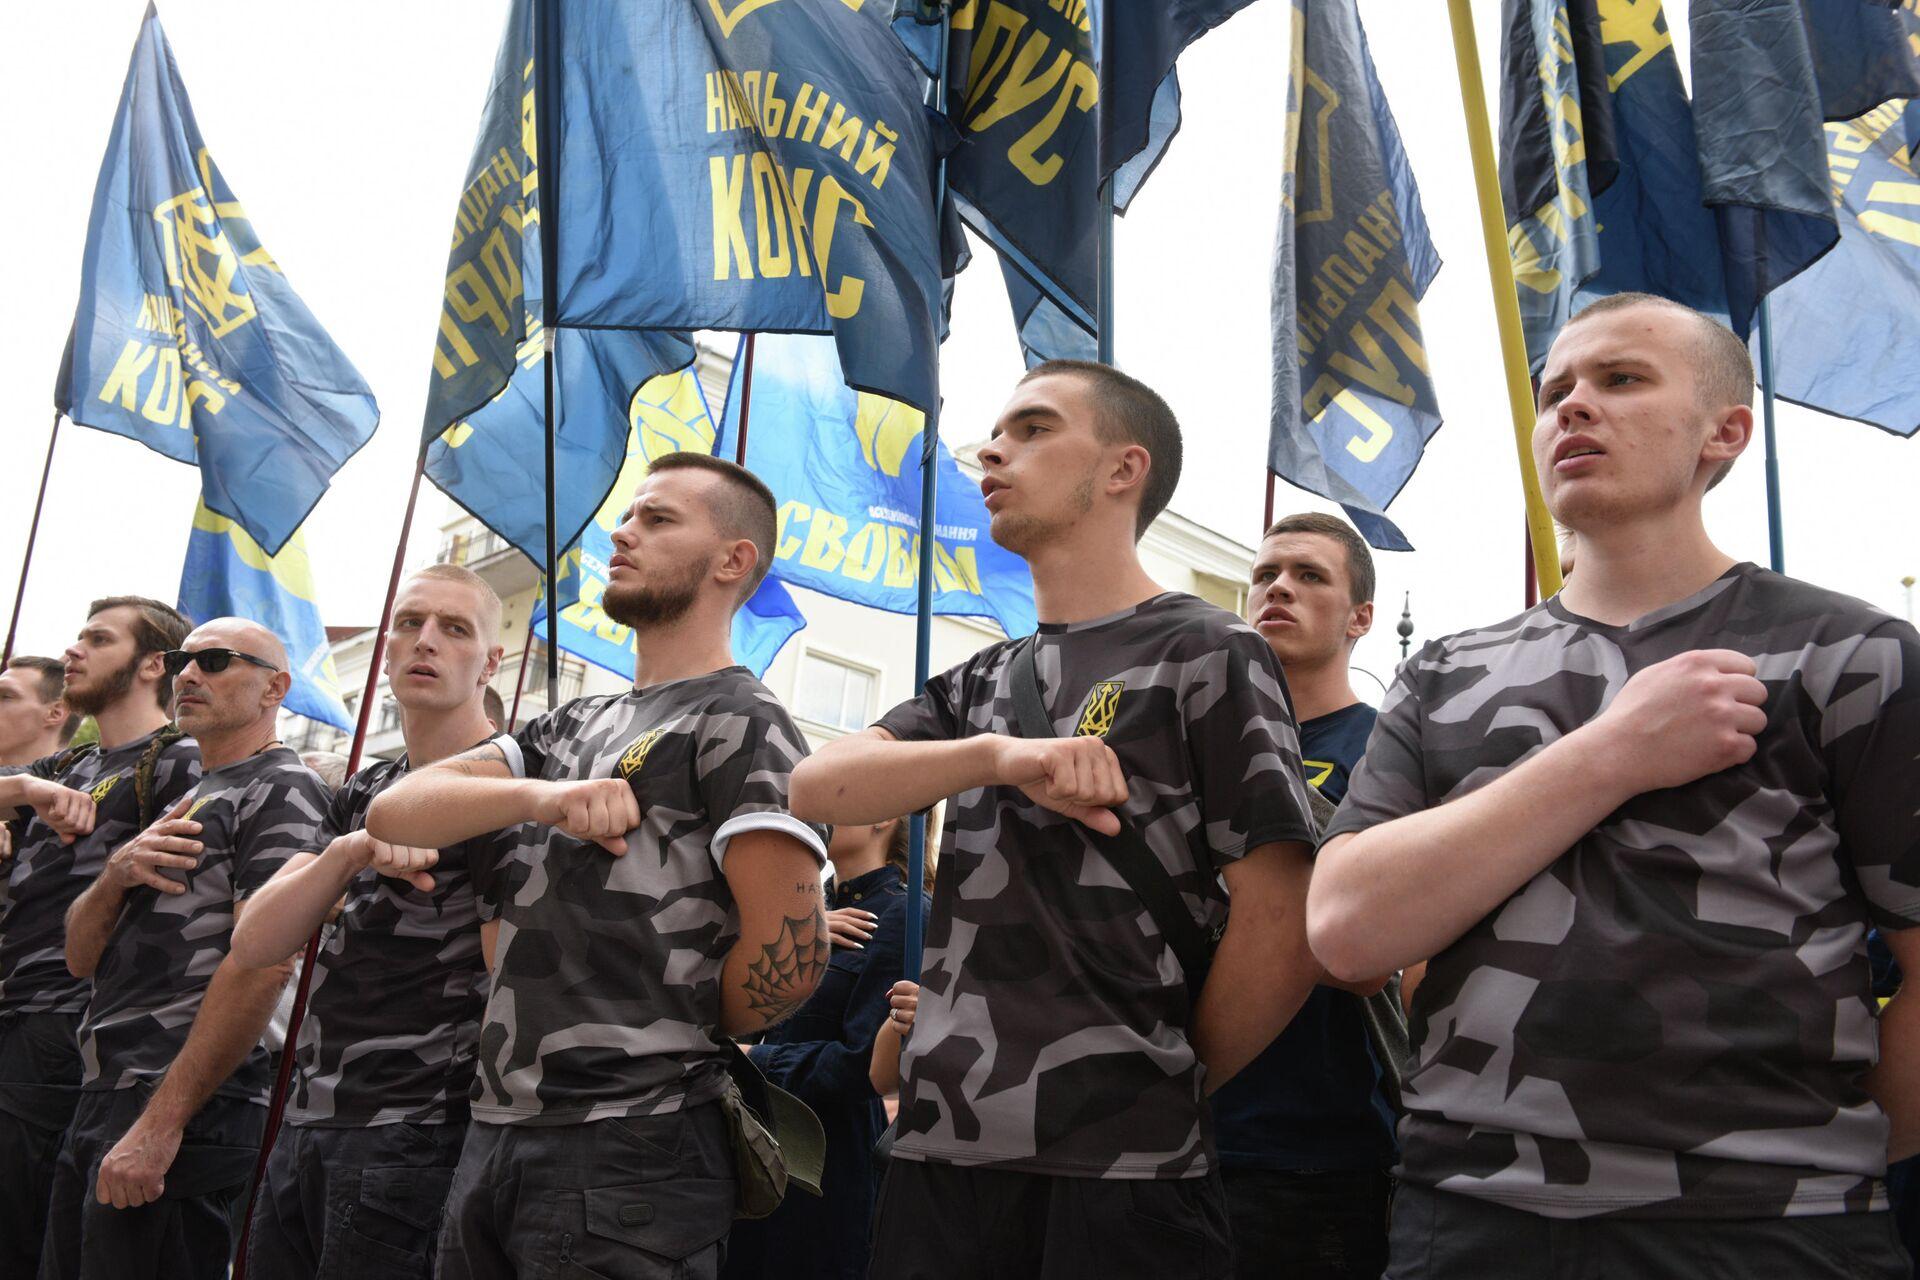 Акция националистов в Киеве - РИА Новости, 1920, 25.09.2020